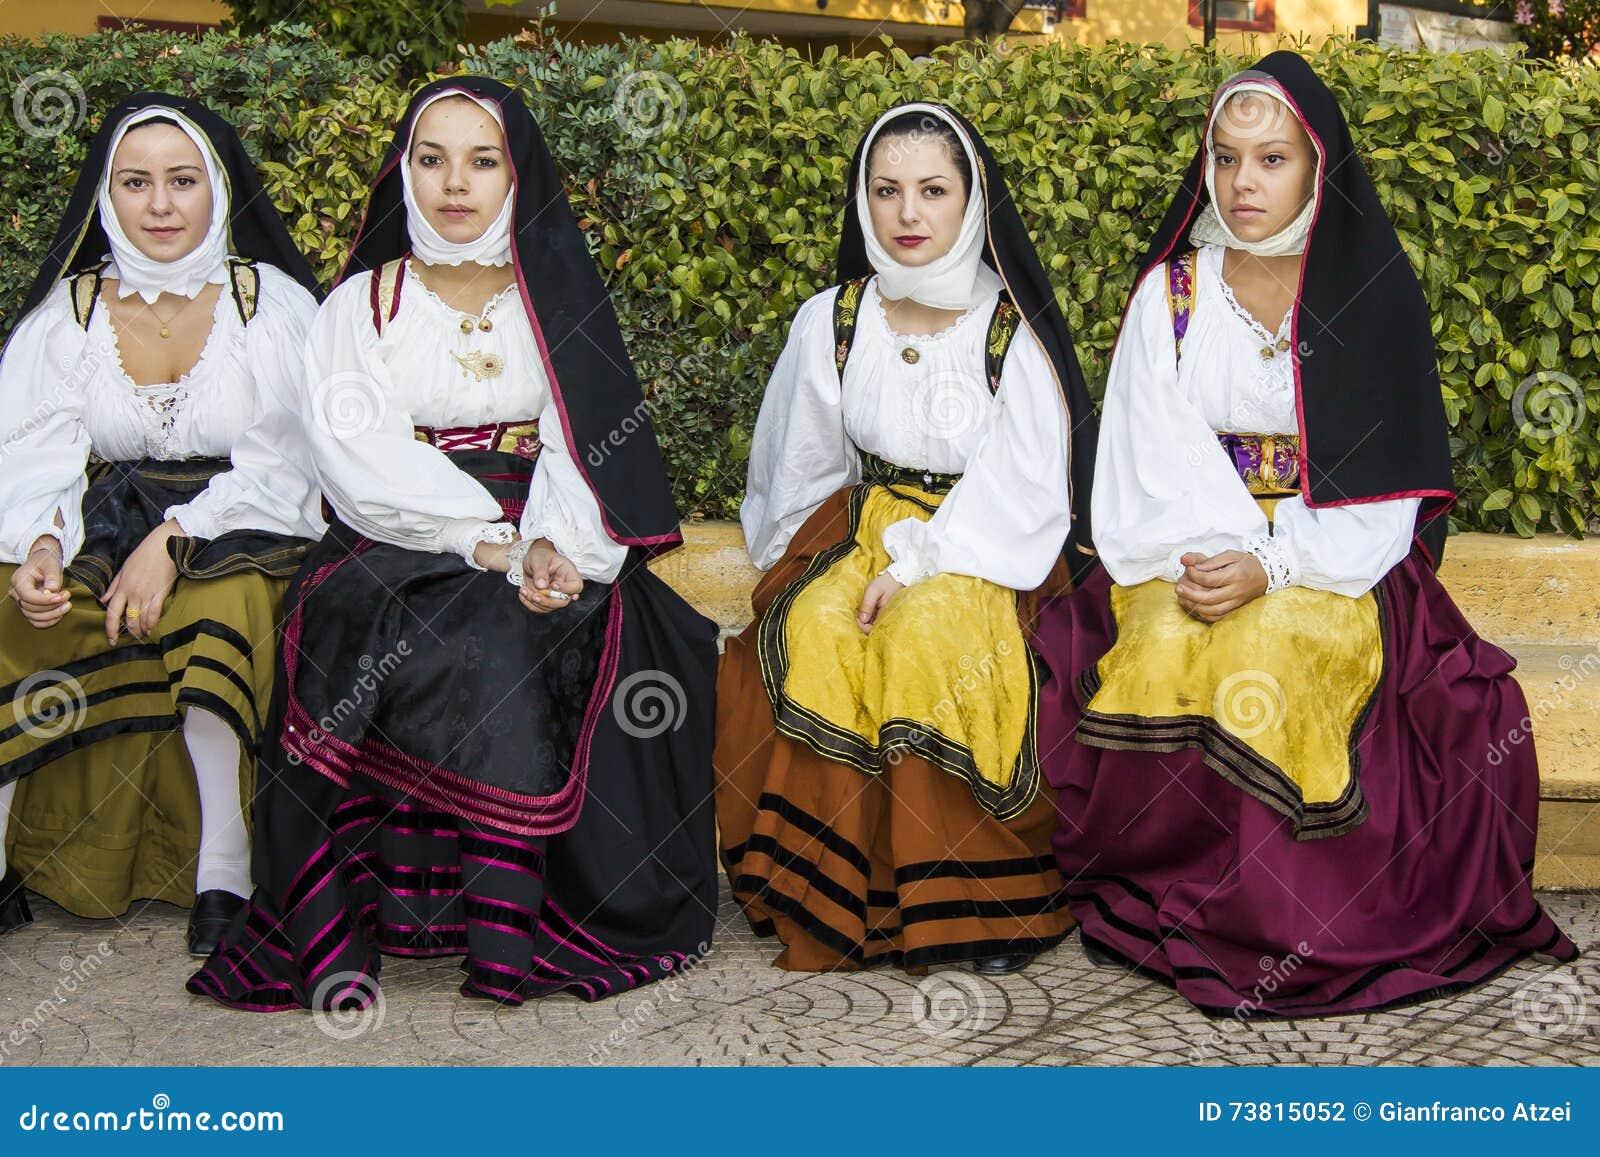 selargius women S salv selargius libertas udine starlight valmadrera reyer venezia groupe sud ancona basket ariano irpino minibasket battipaglia libertas.